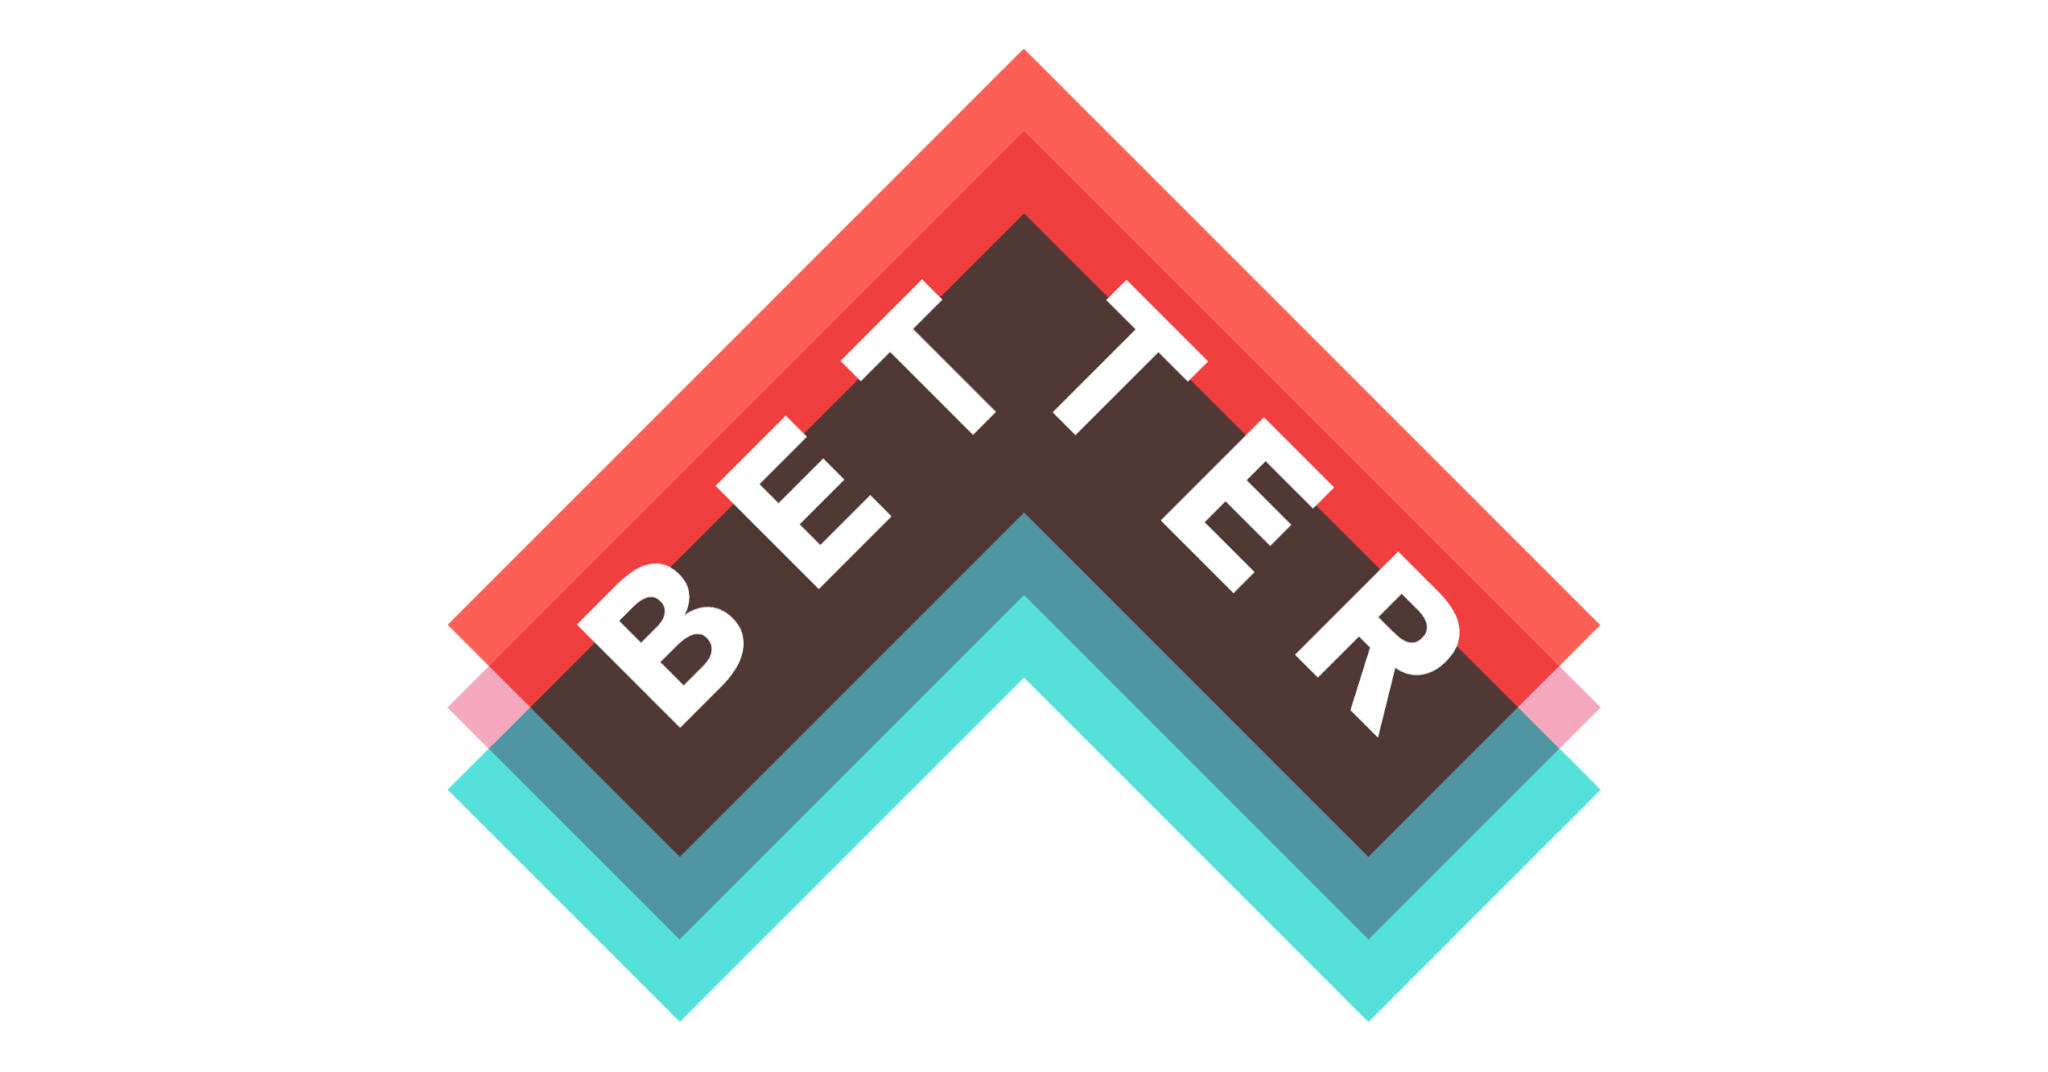 Better_LOGO_Colors_RGB_Facebook.png